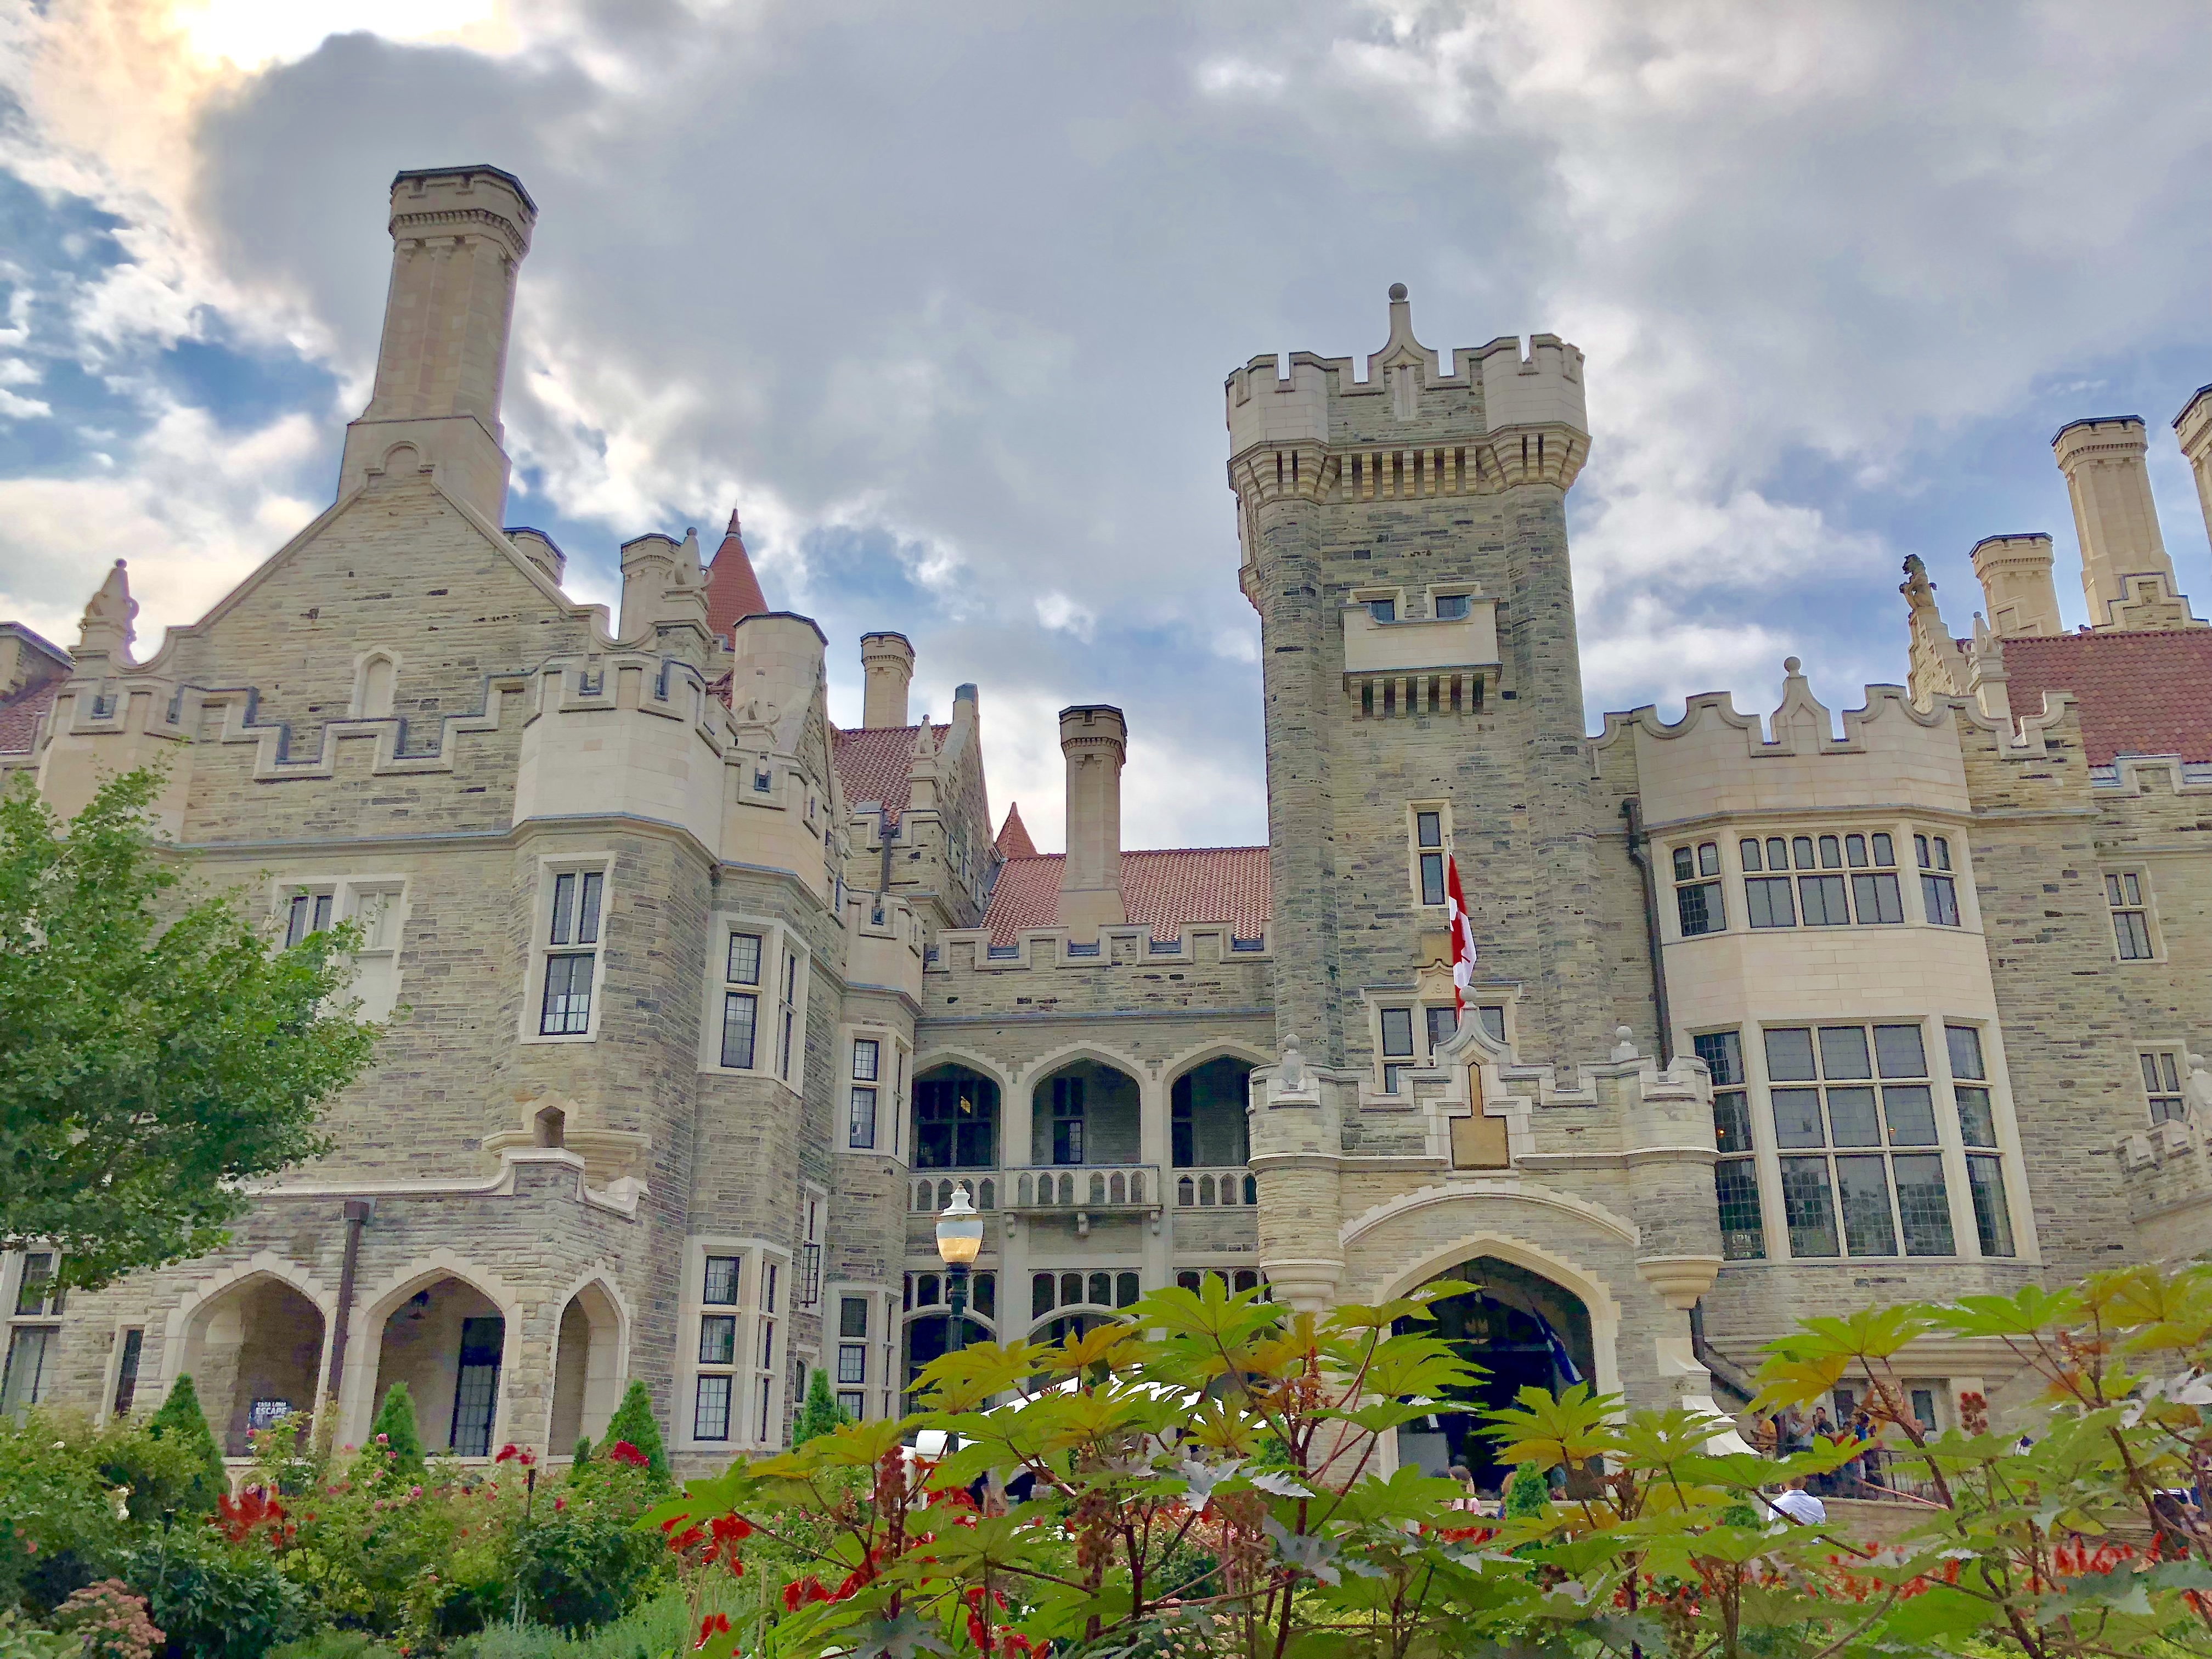 toronto, cn tower, travel tuesday, travel, casa loma, castle